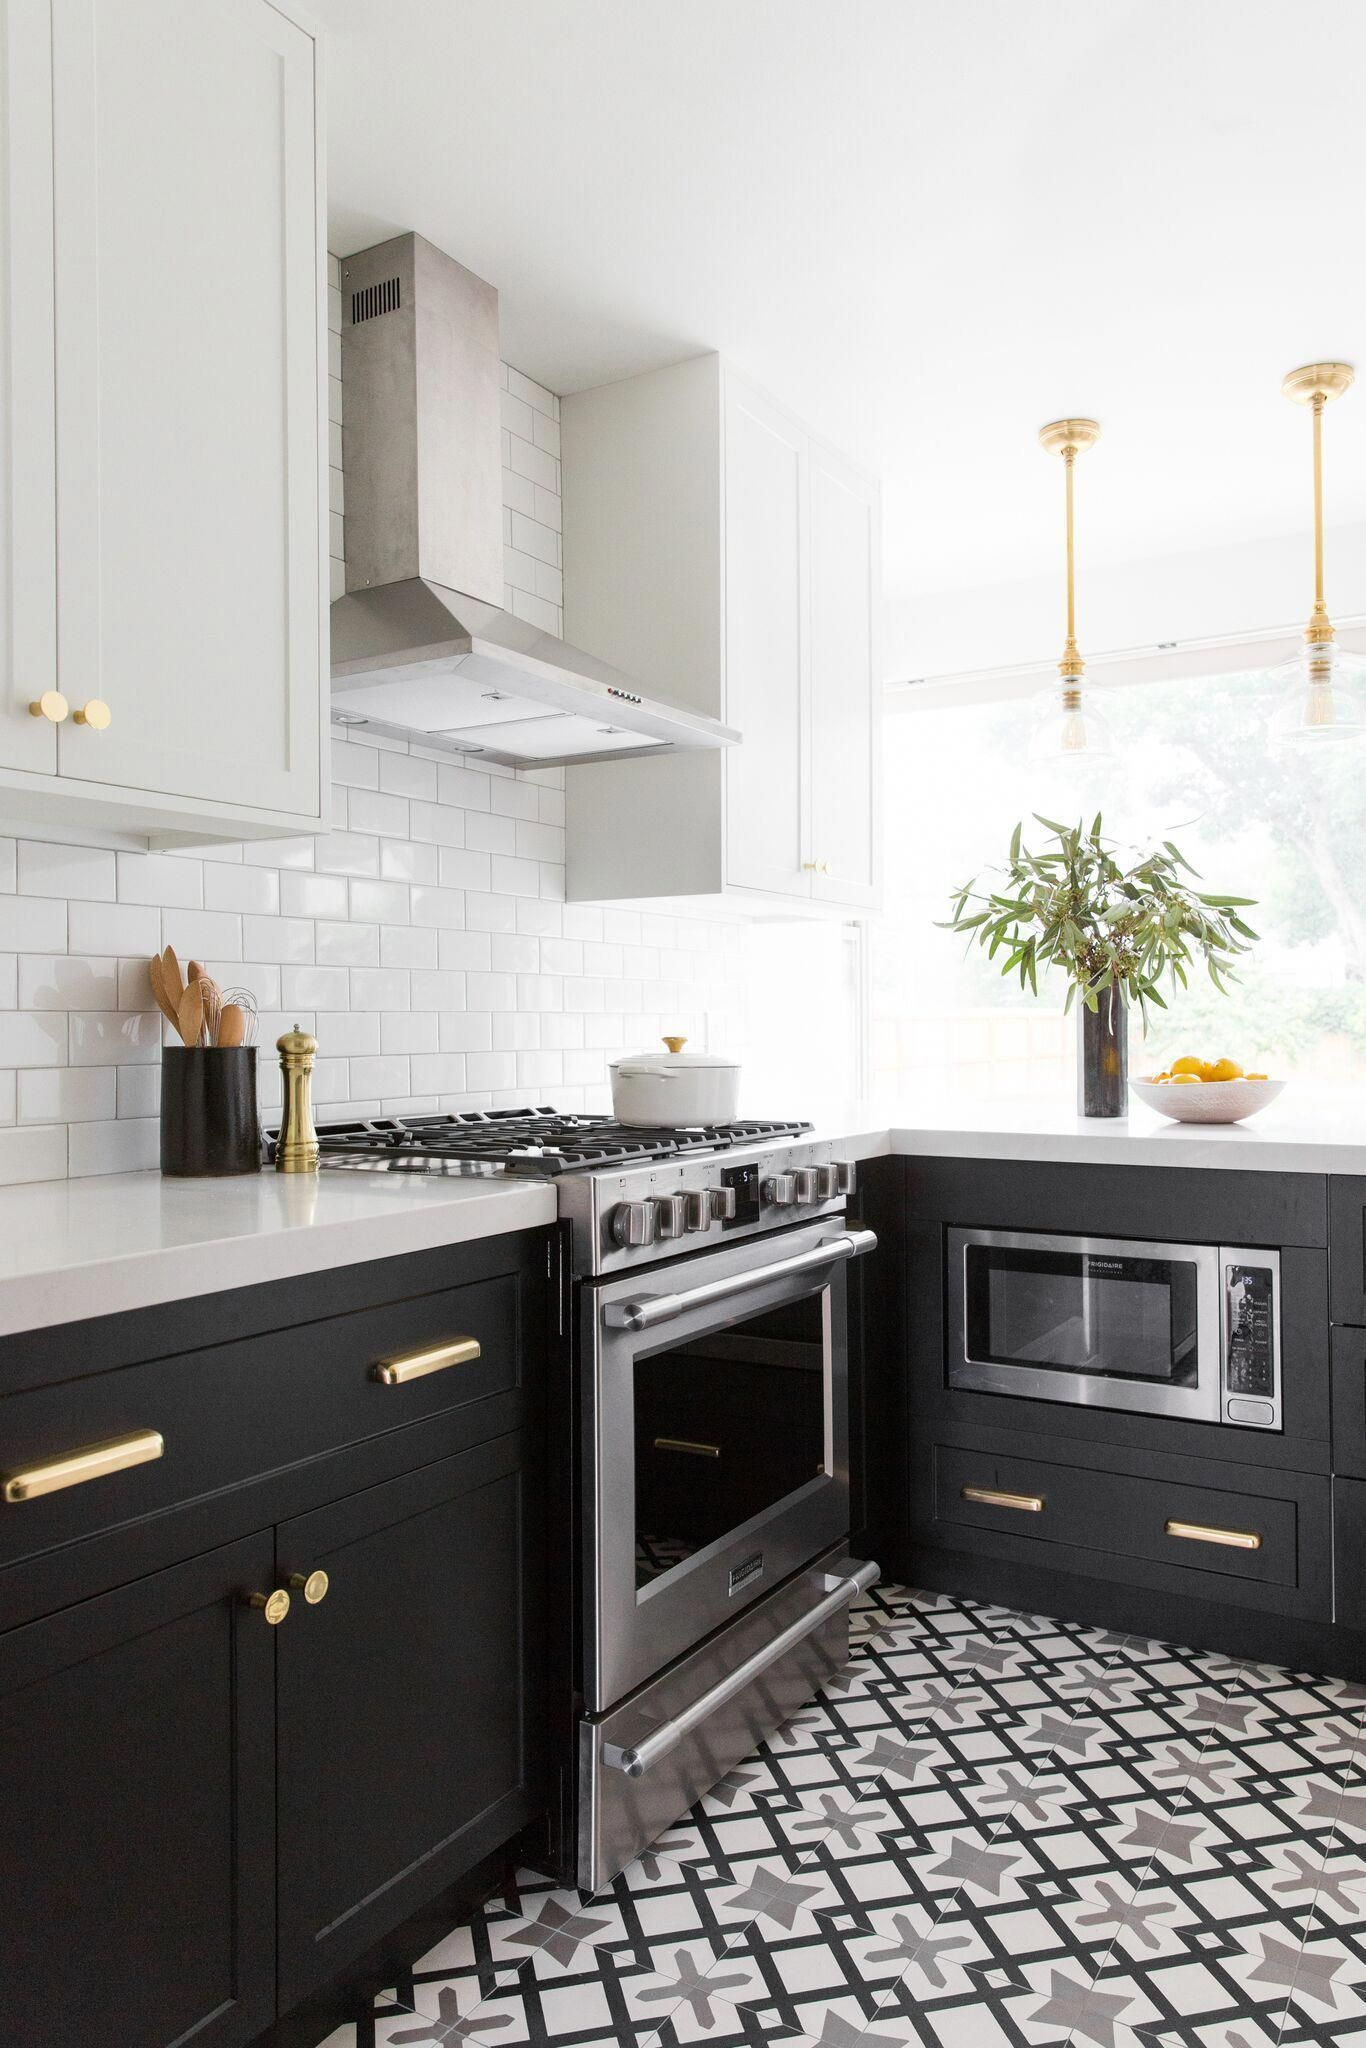 hillside kitchen remodel reveal — studio mcgee #remodeling | kitchen remodel, kitchen design